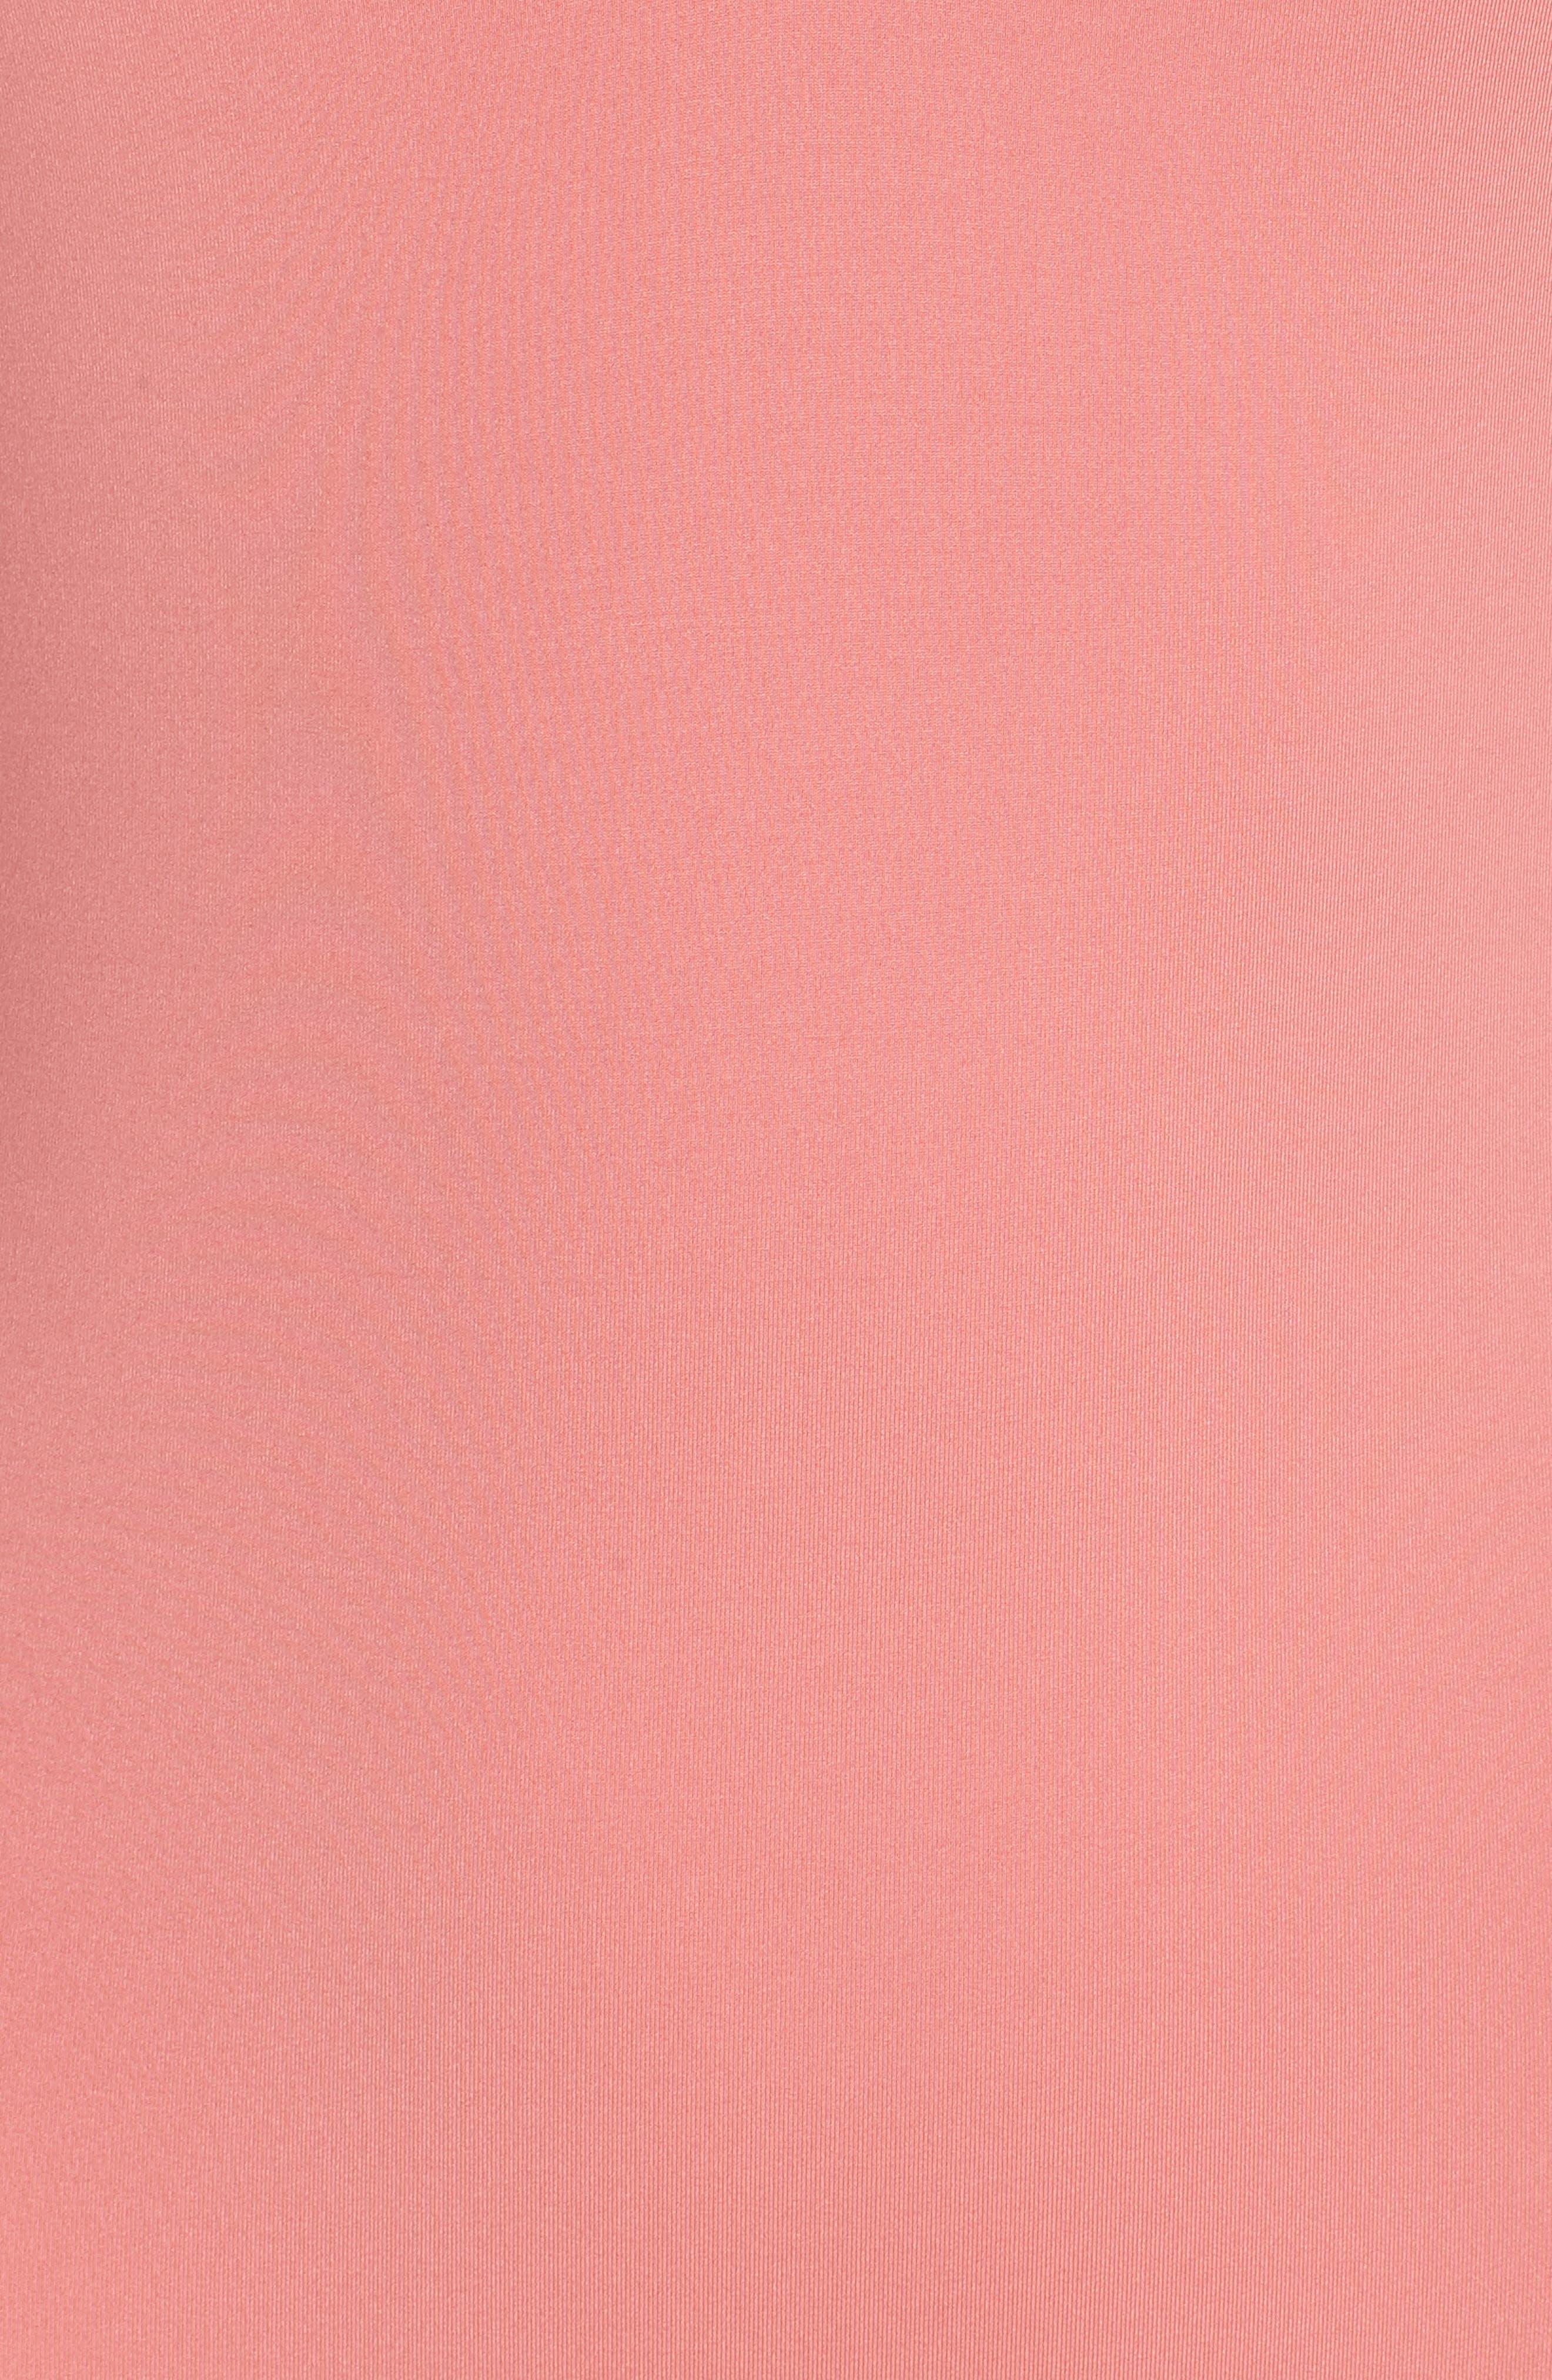 Playa Montauk Strappy One-Piece Swimsuit,                             Alternate thumbnail 5, color,                             Vintage Pink Multi